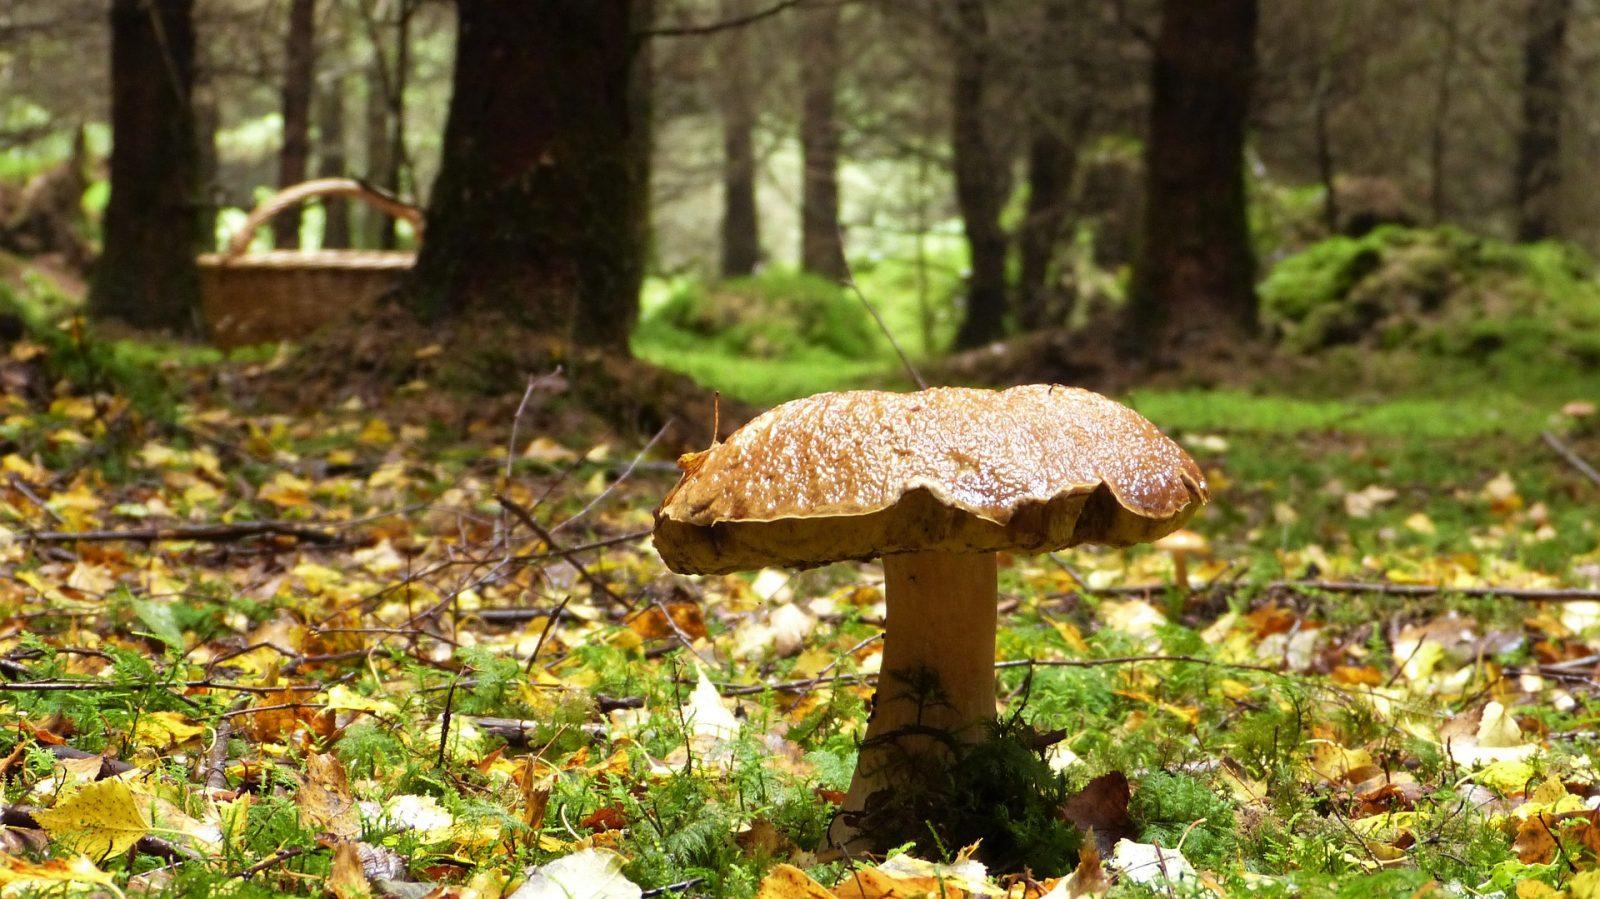 Sortie champignons à LA LOUPE - 2  © Image-parsilviarita-de-Pixabay-